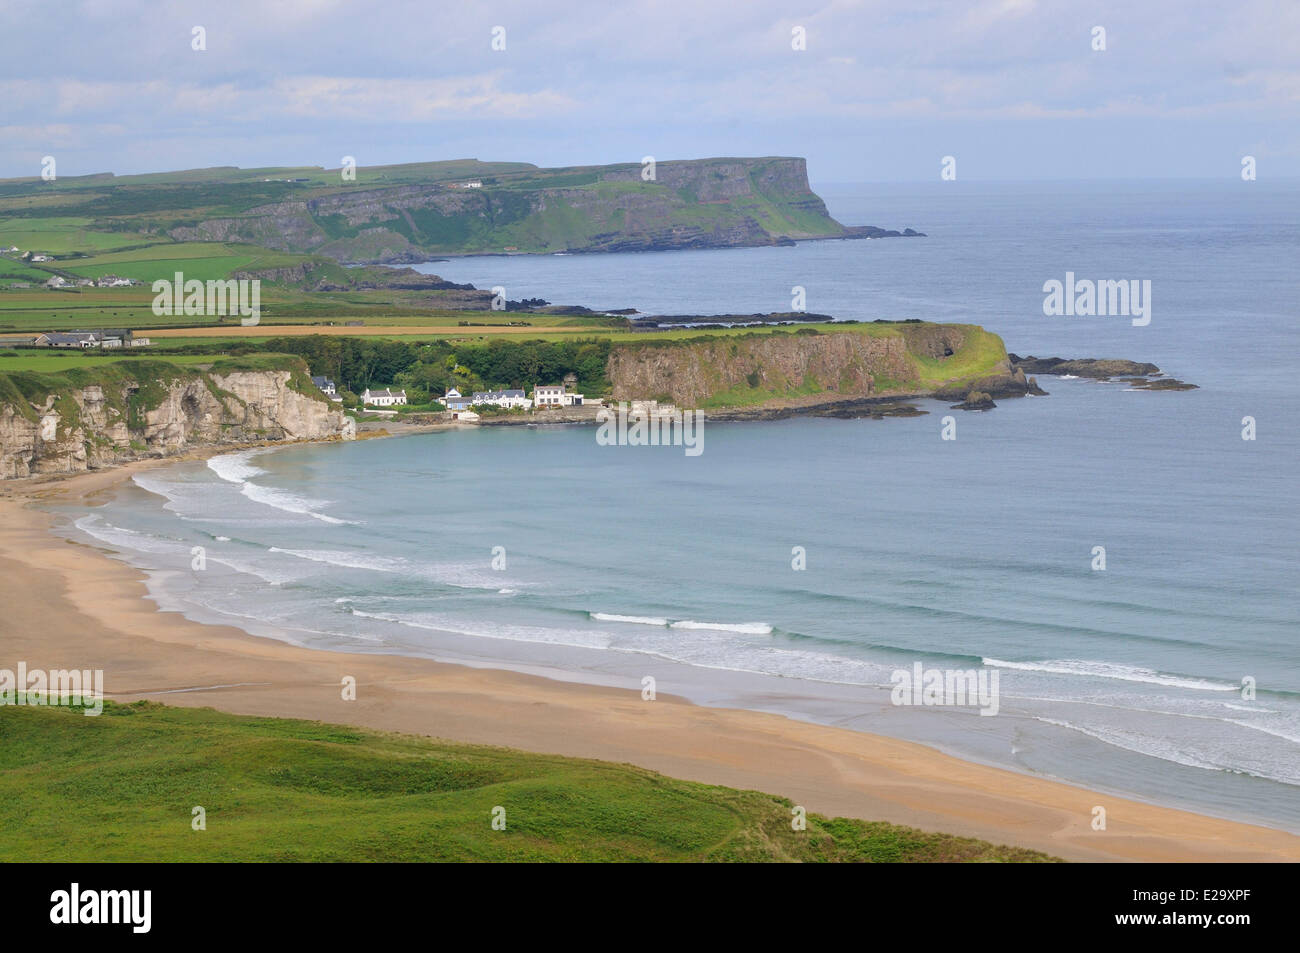 United Kingdom, Northern Ireland, County Antrim, Antrim coast, White park bay and Portbradden harbour - Stock Image